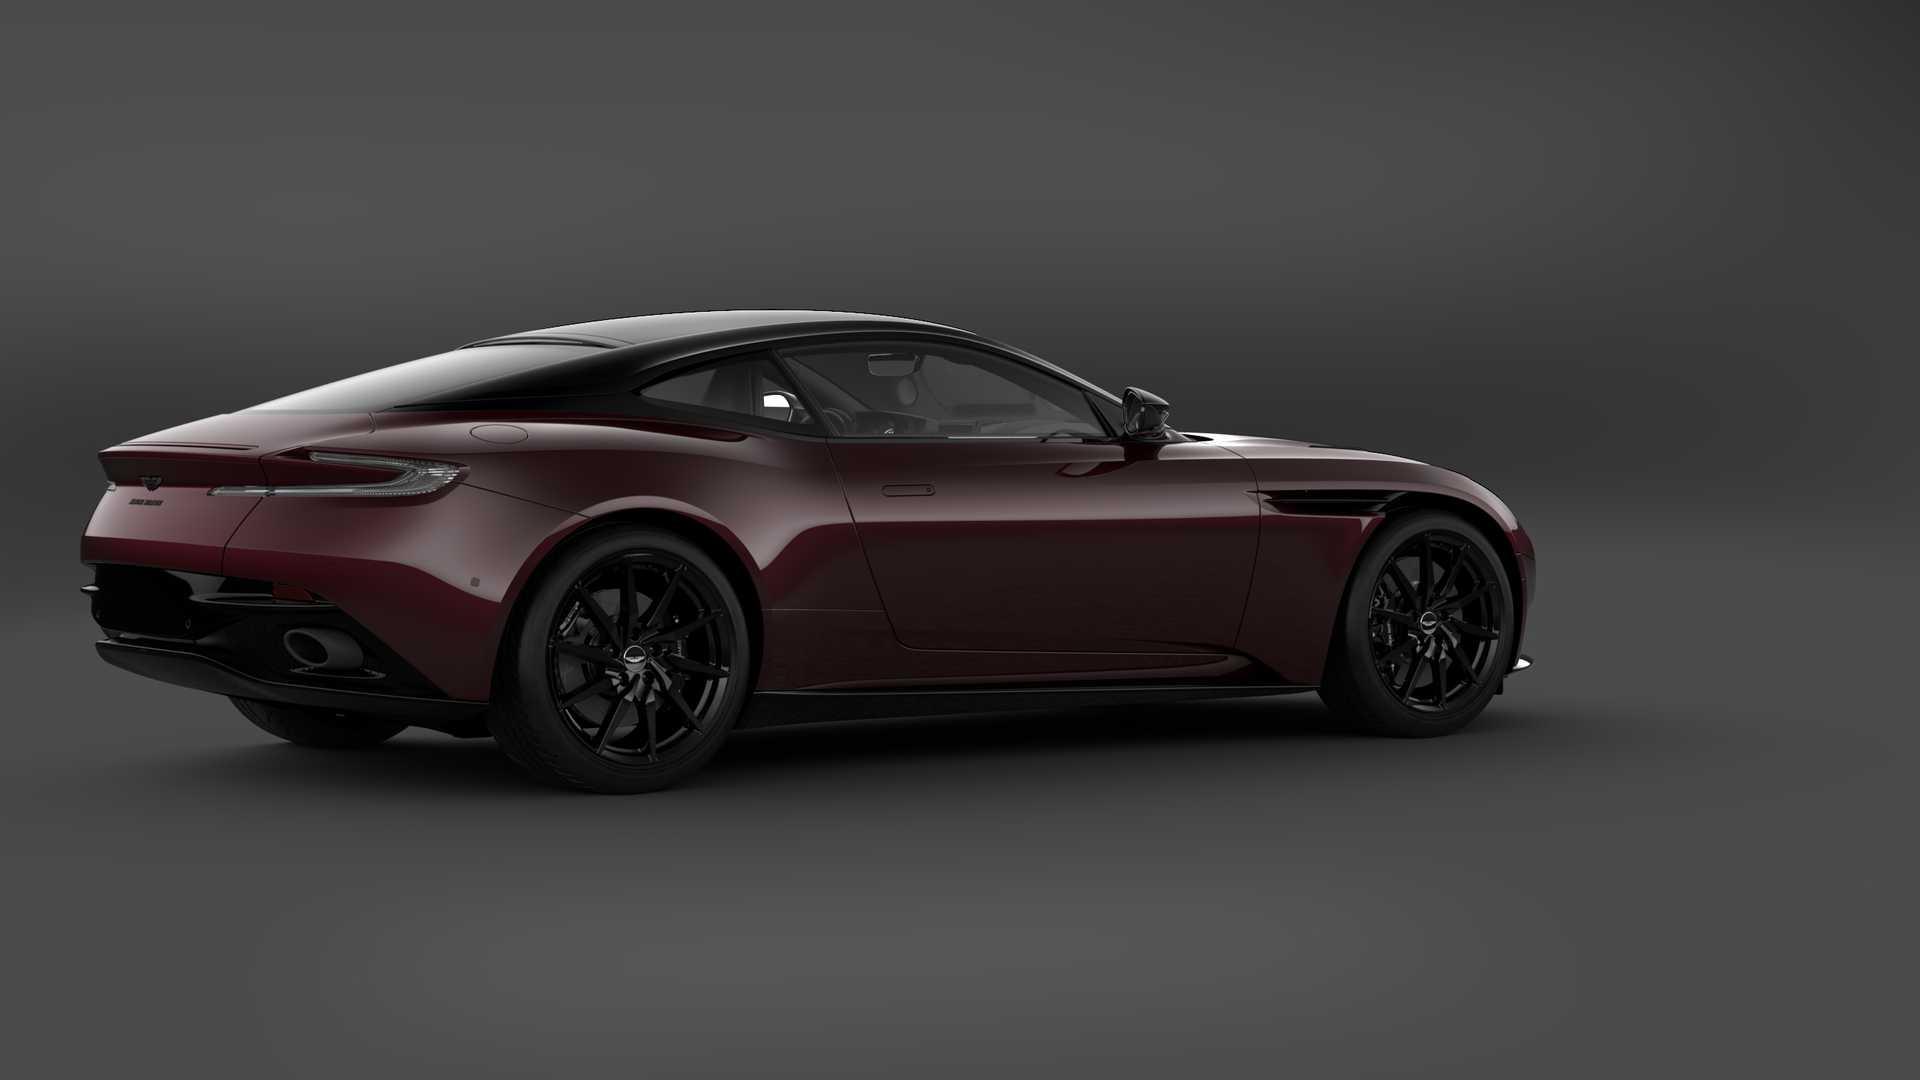 Aston-Martin-DB11-V8-Shadow-Edition-2